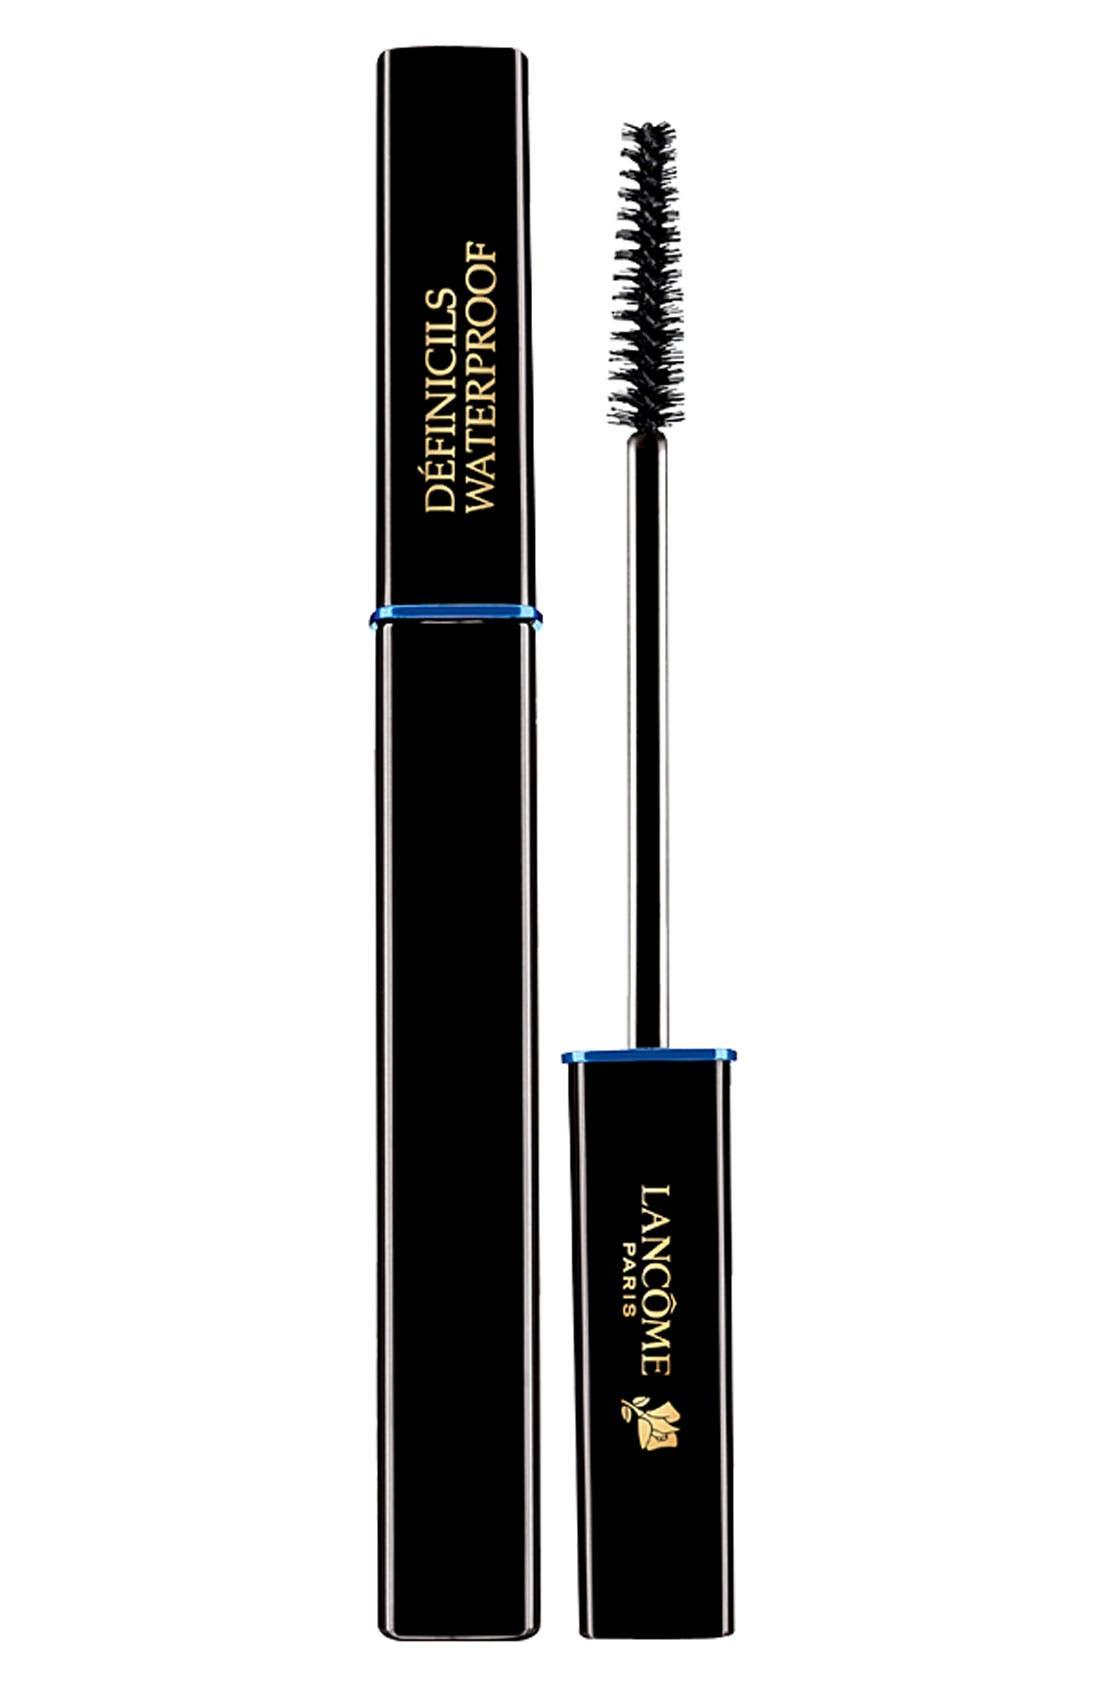 Lancome Definicils Lengthening And Defining Waterproof Mascara